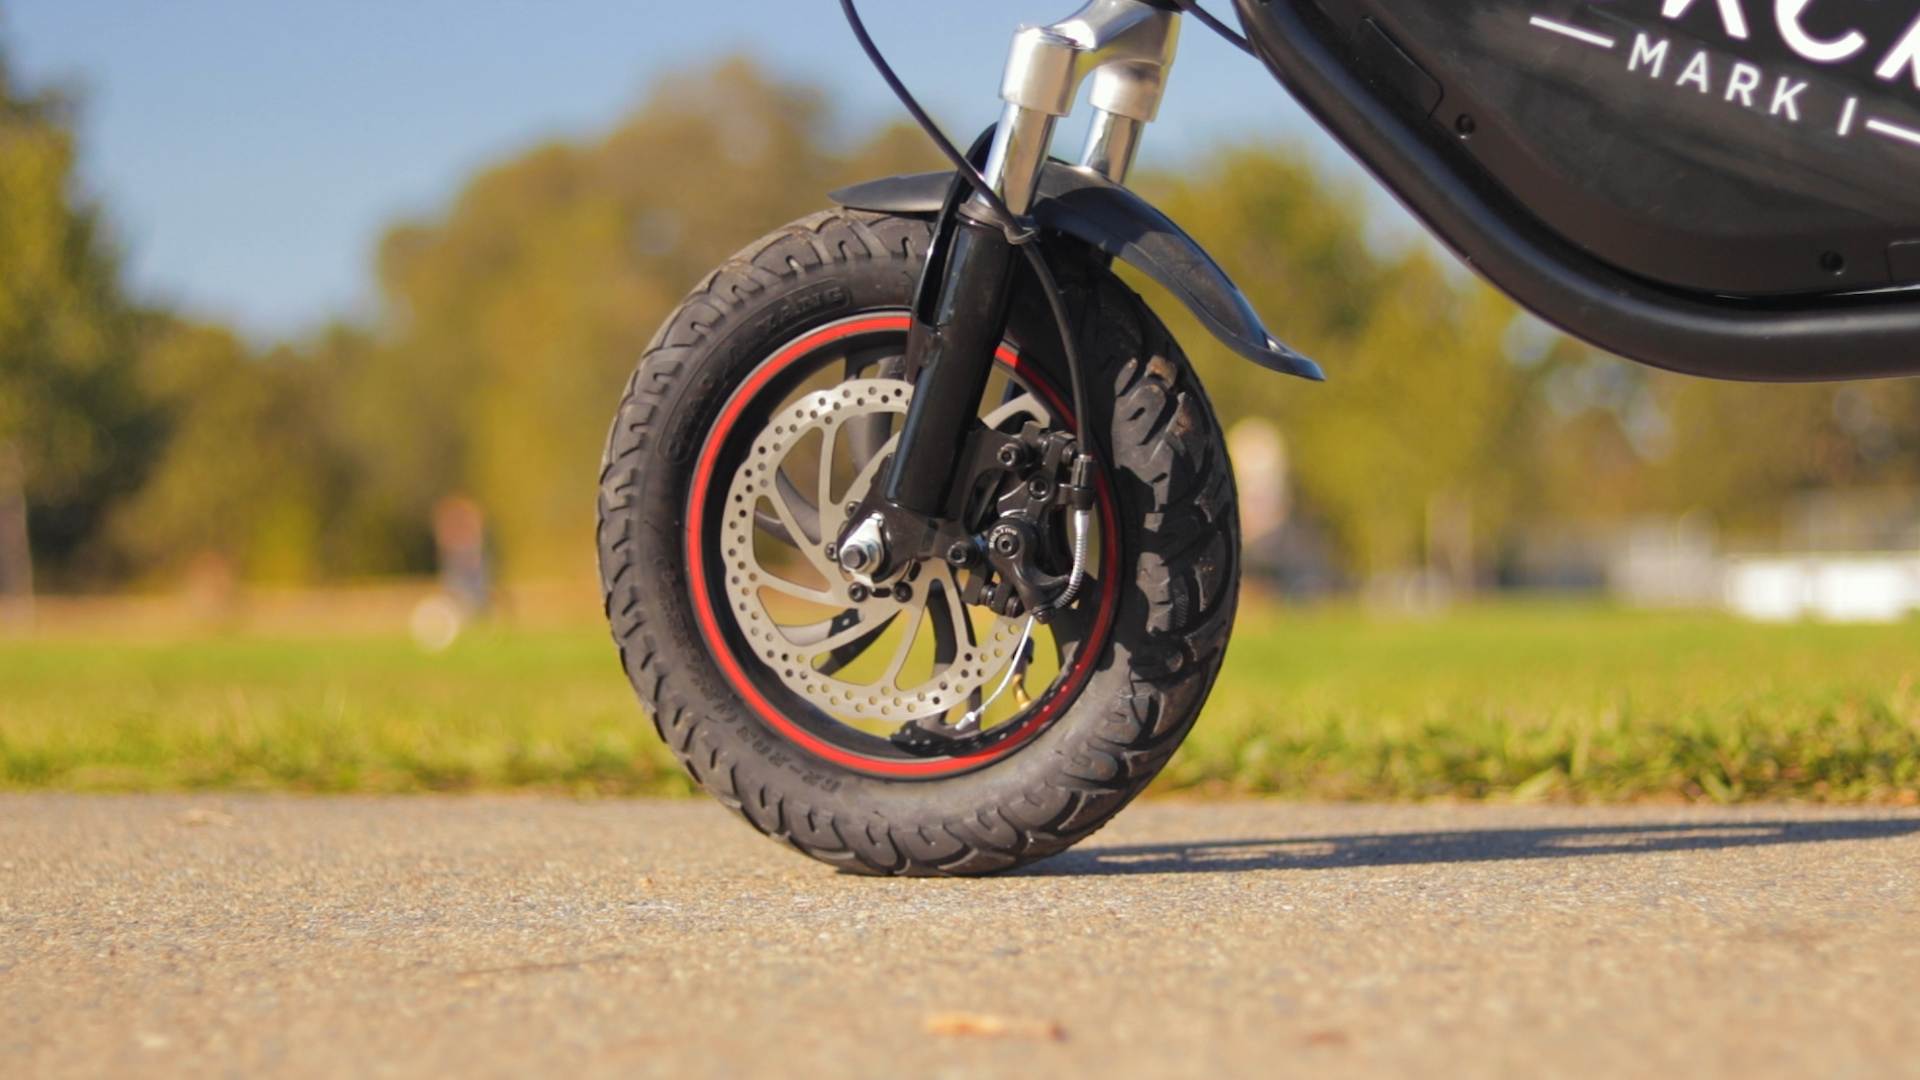 voro-motors-orca-mark-1-electric-scooter-review-2019-brake.jpg